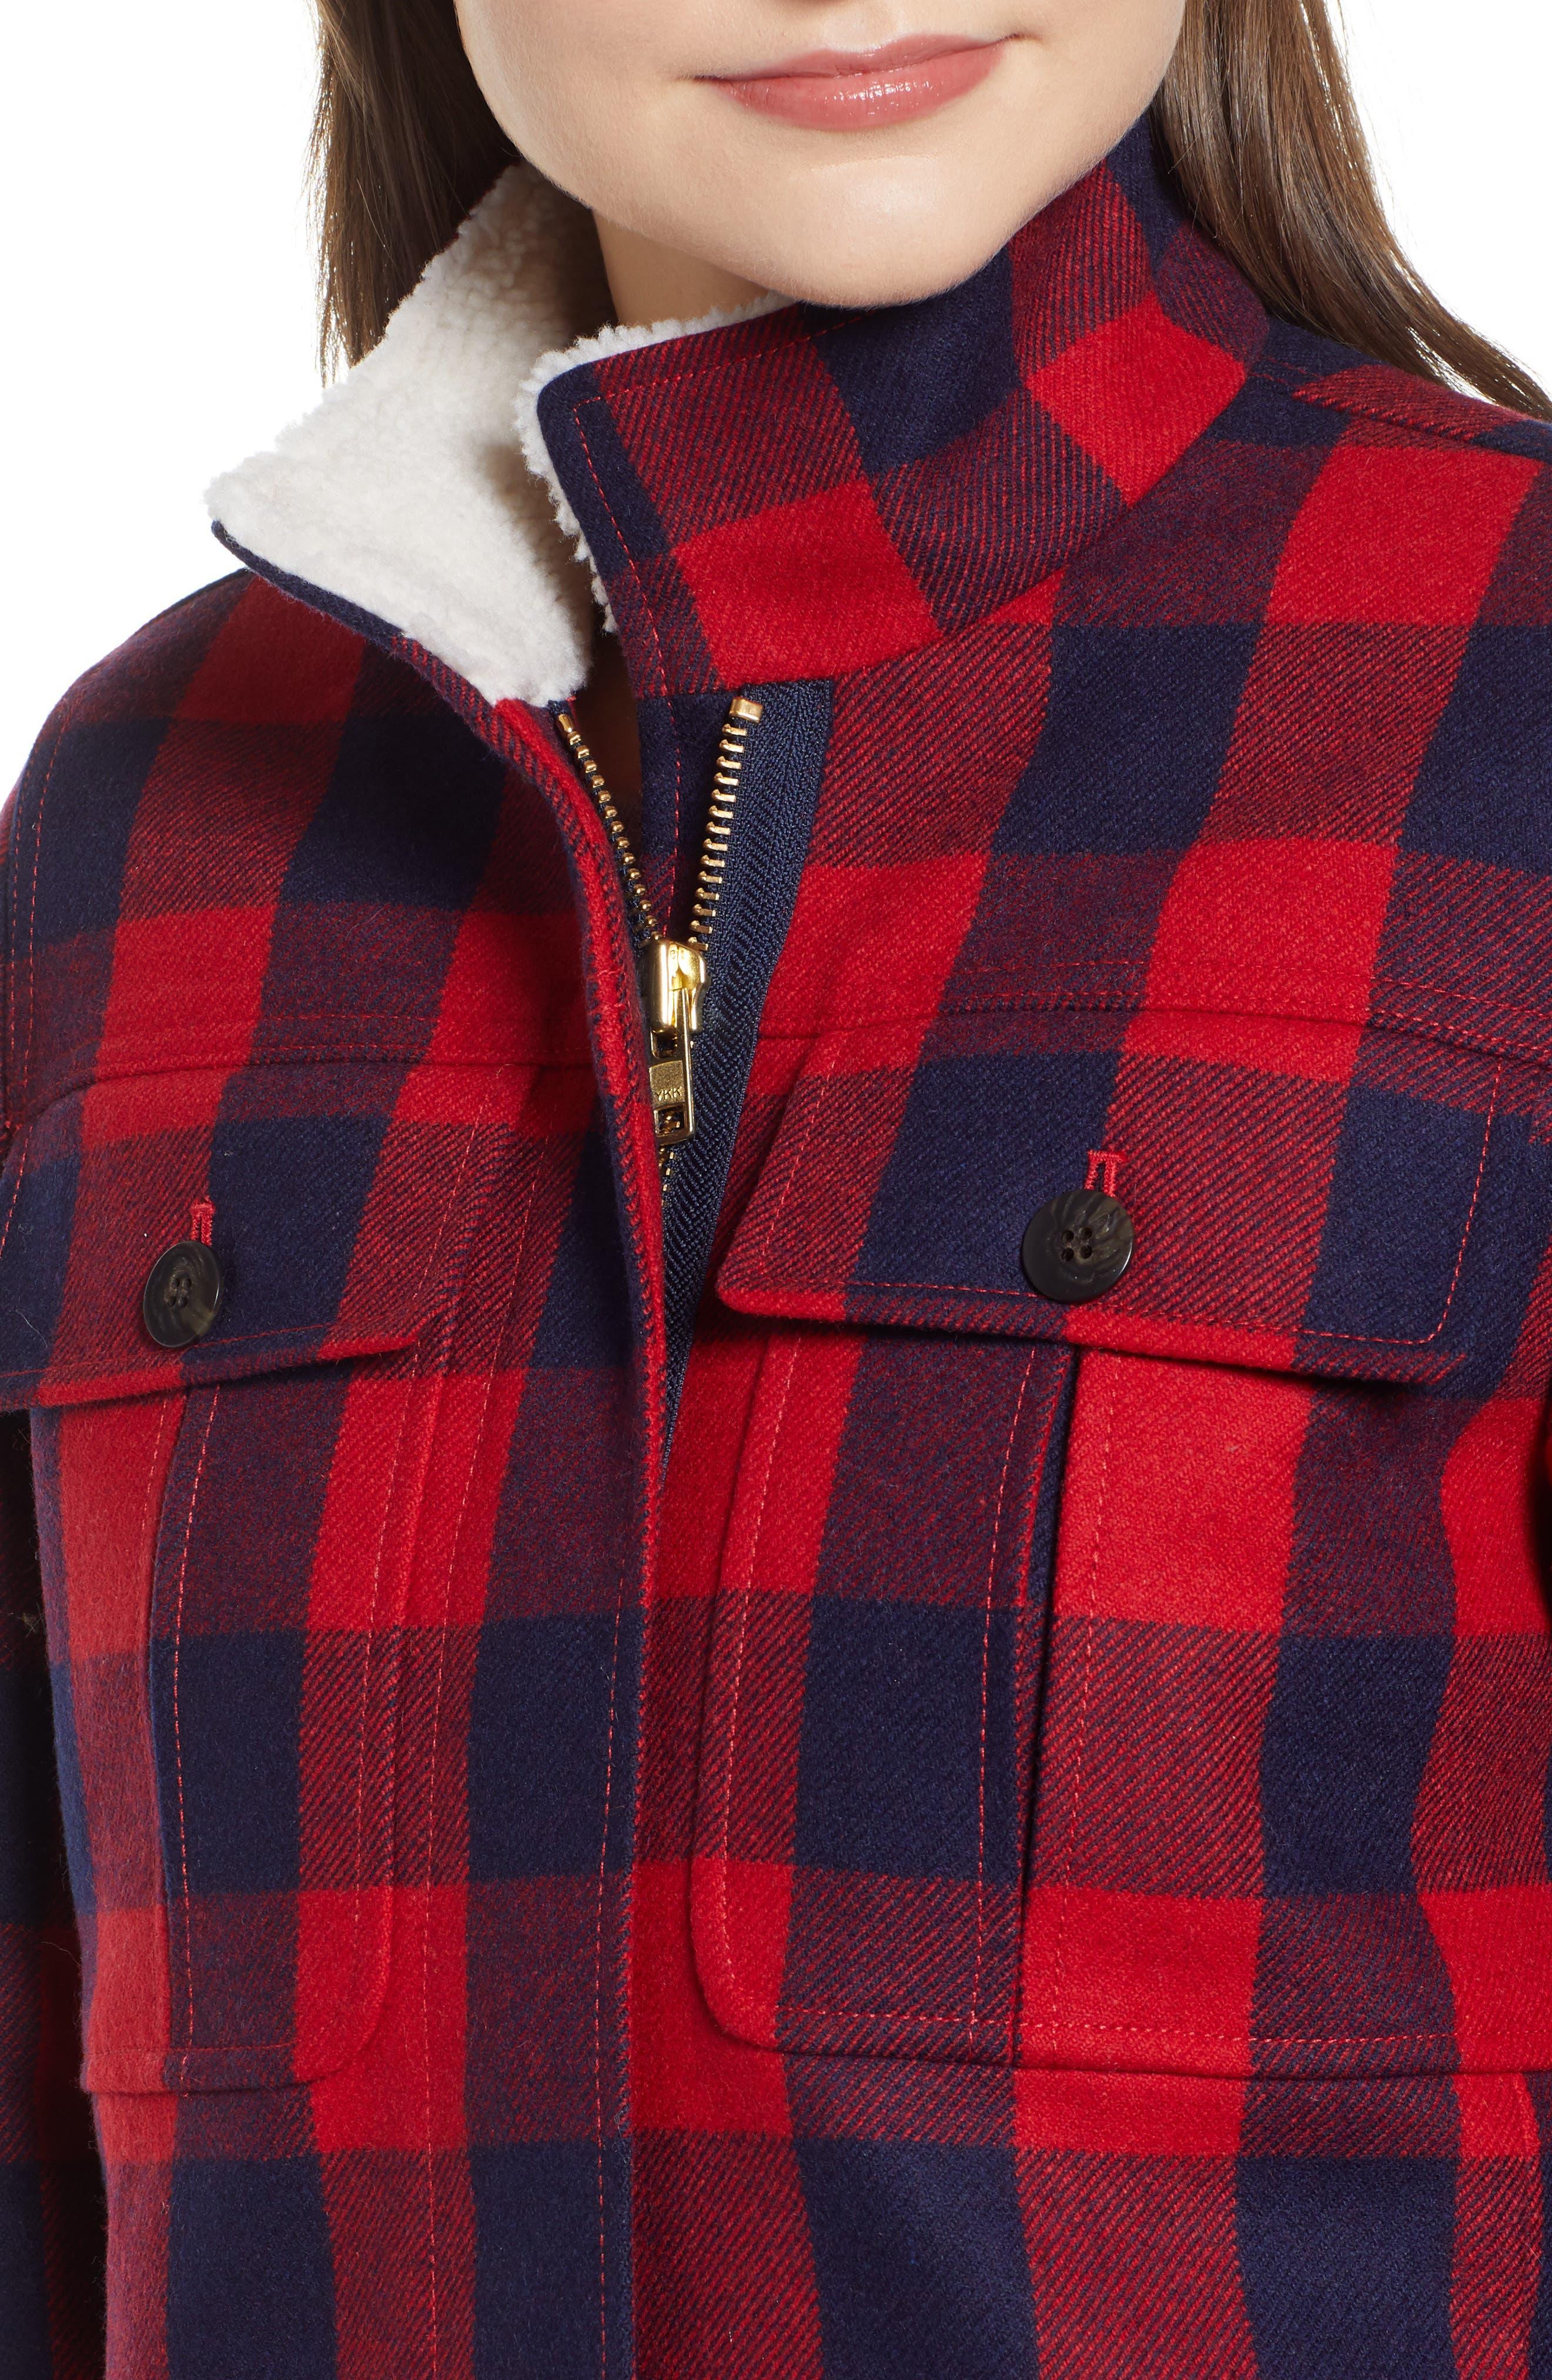 Buffalo Check Workwear Jacket with Faux Shearling Lining,                             Alternate thumbnail 4, color,                             RED NAVY BUFFALO